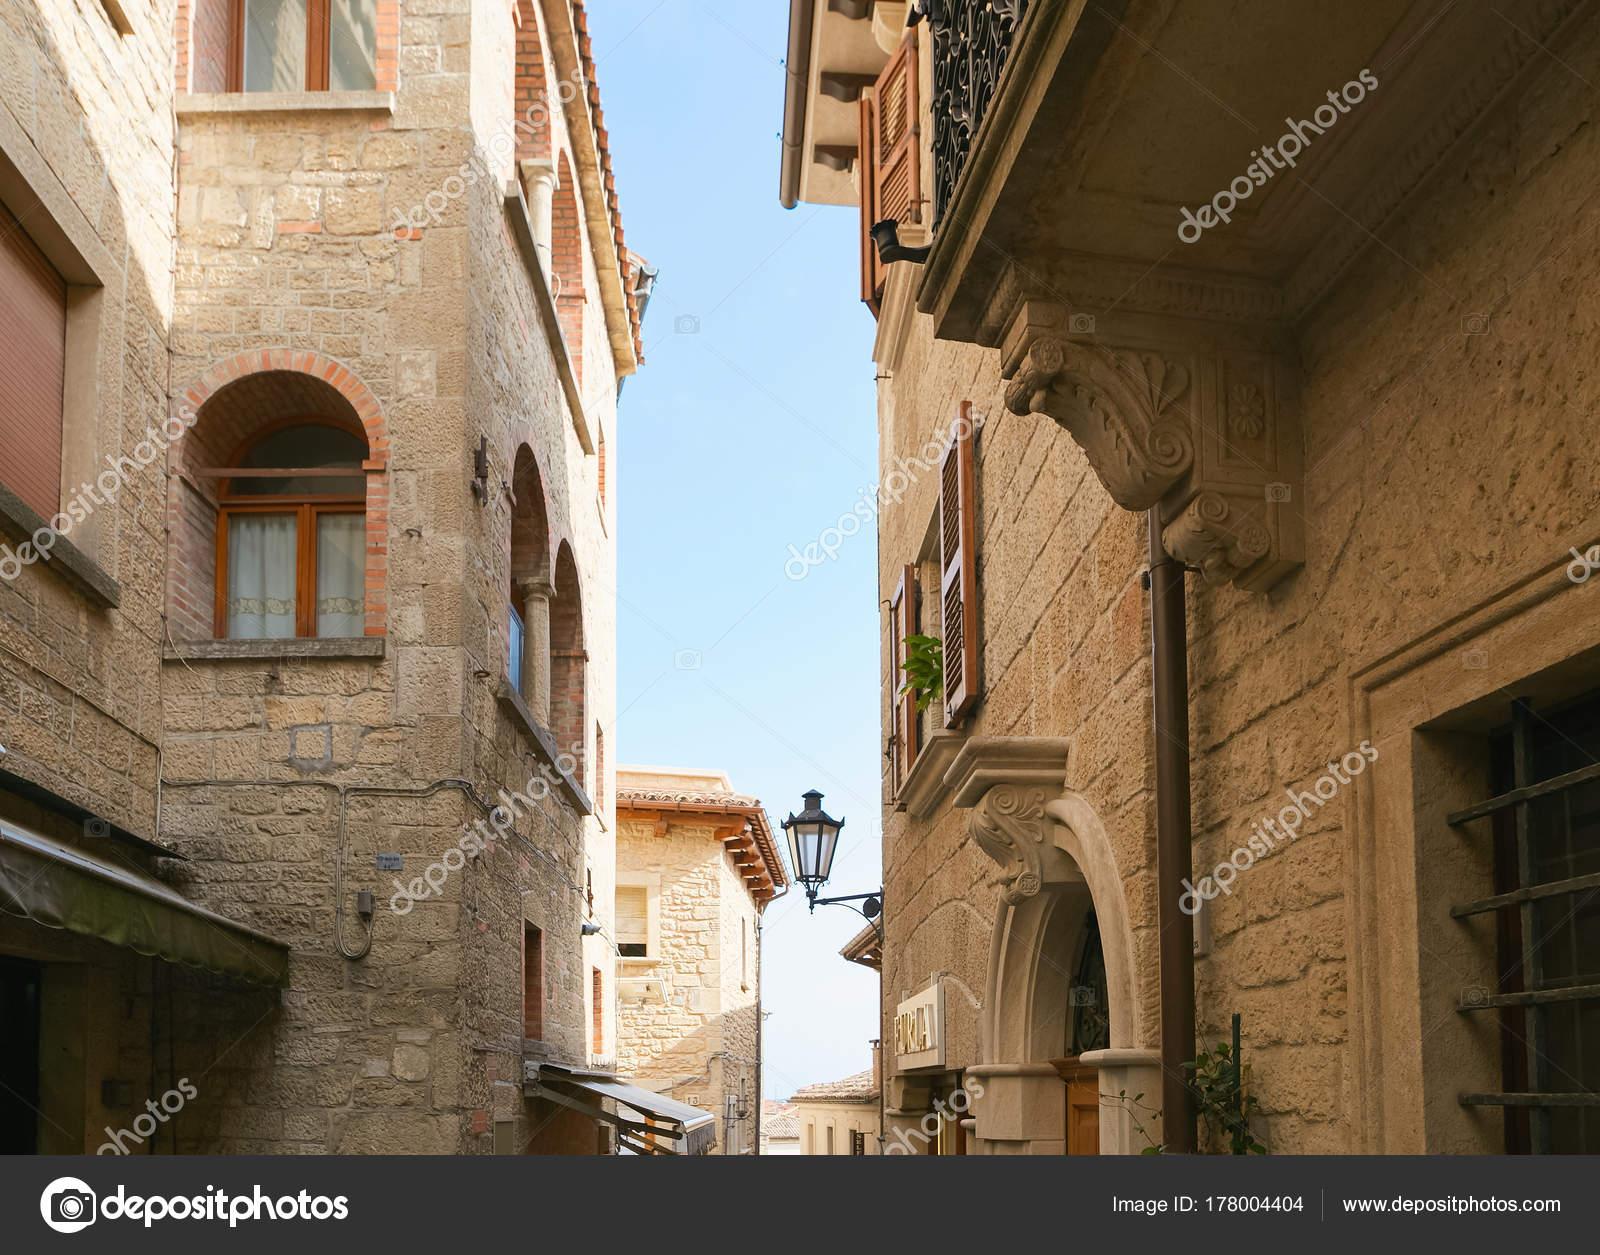 San marino, San Marino - July 10, 2017: design of a stone house with ...